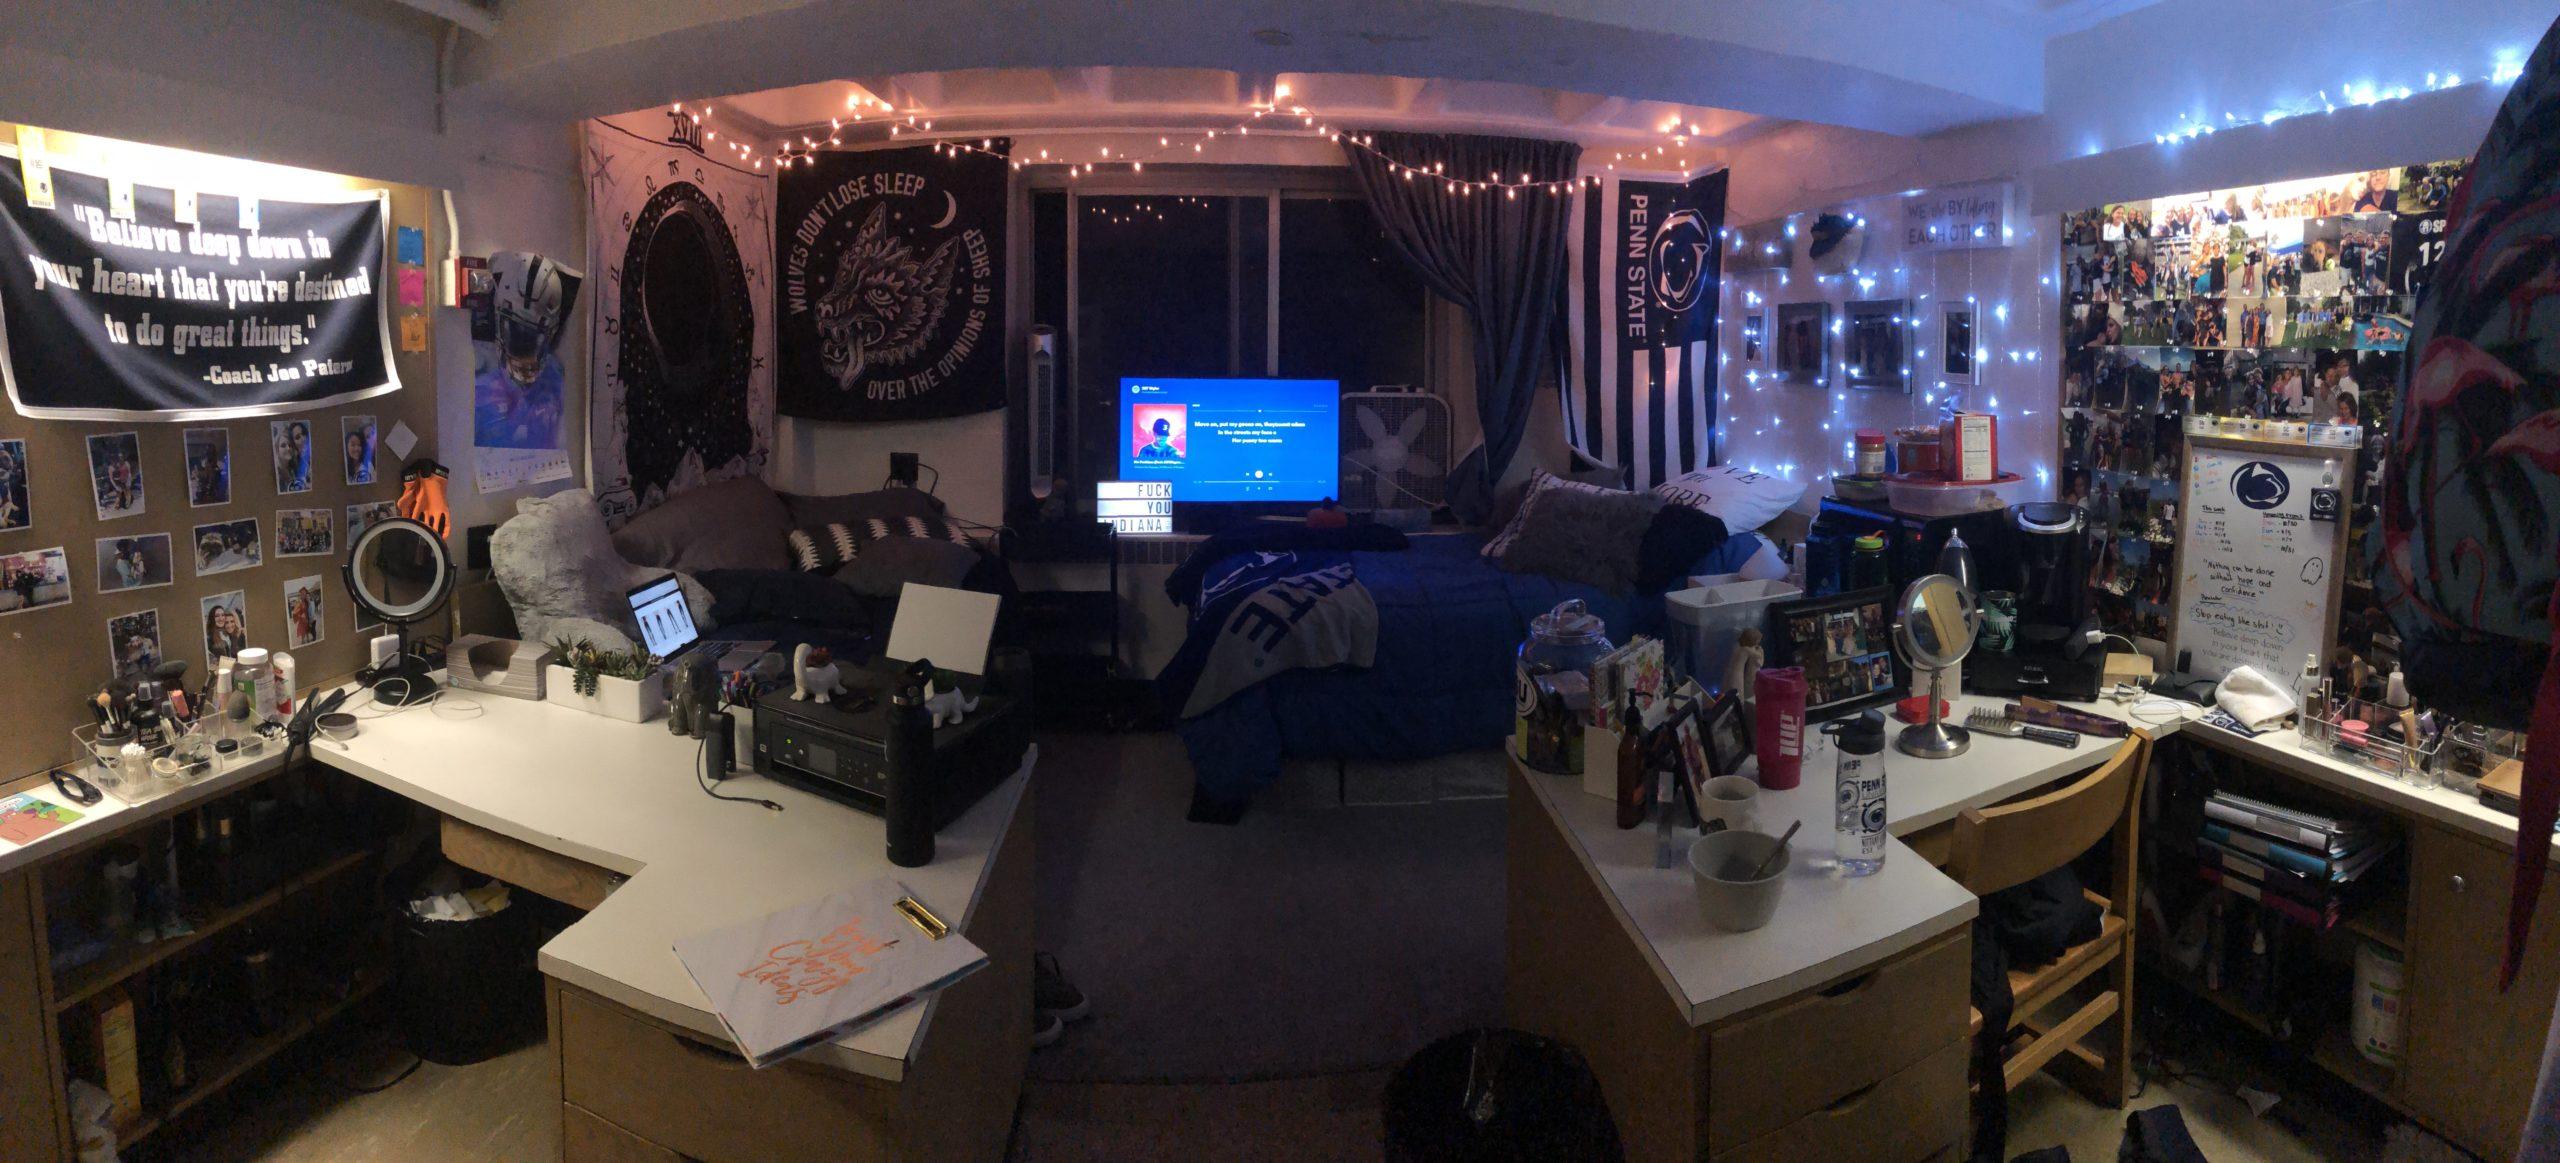 Freshman 101 Choosing The Right Dorm Onward State